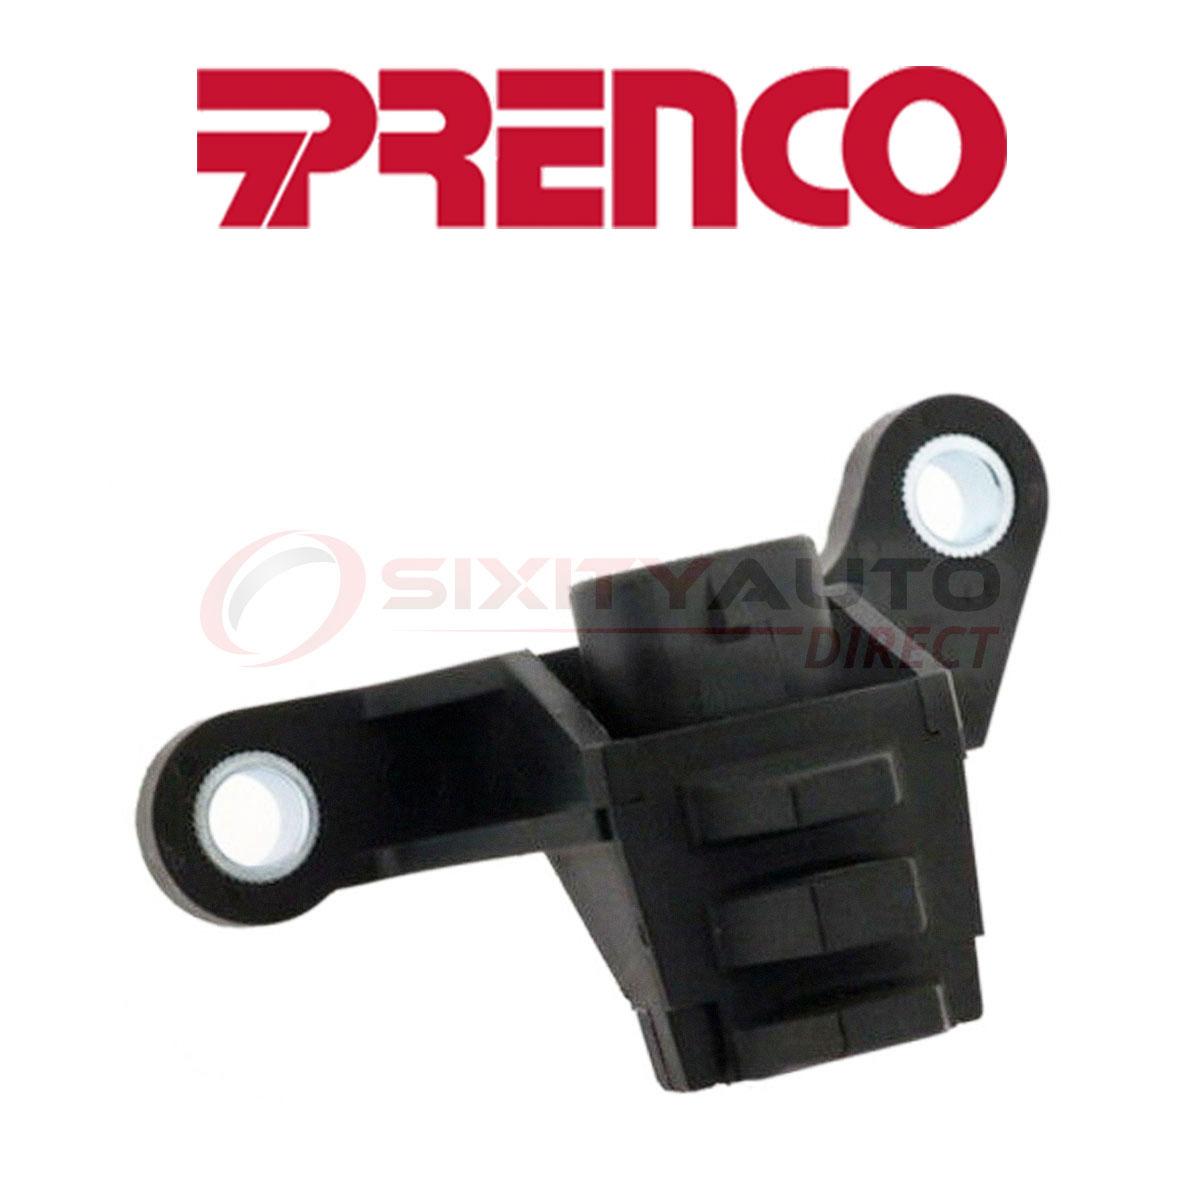 Prenco Crankshaft Position Sensor For 2005